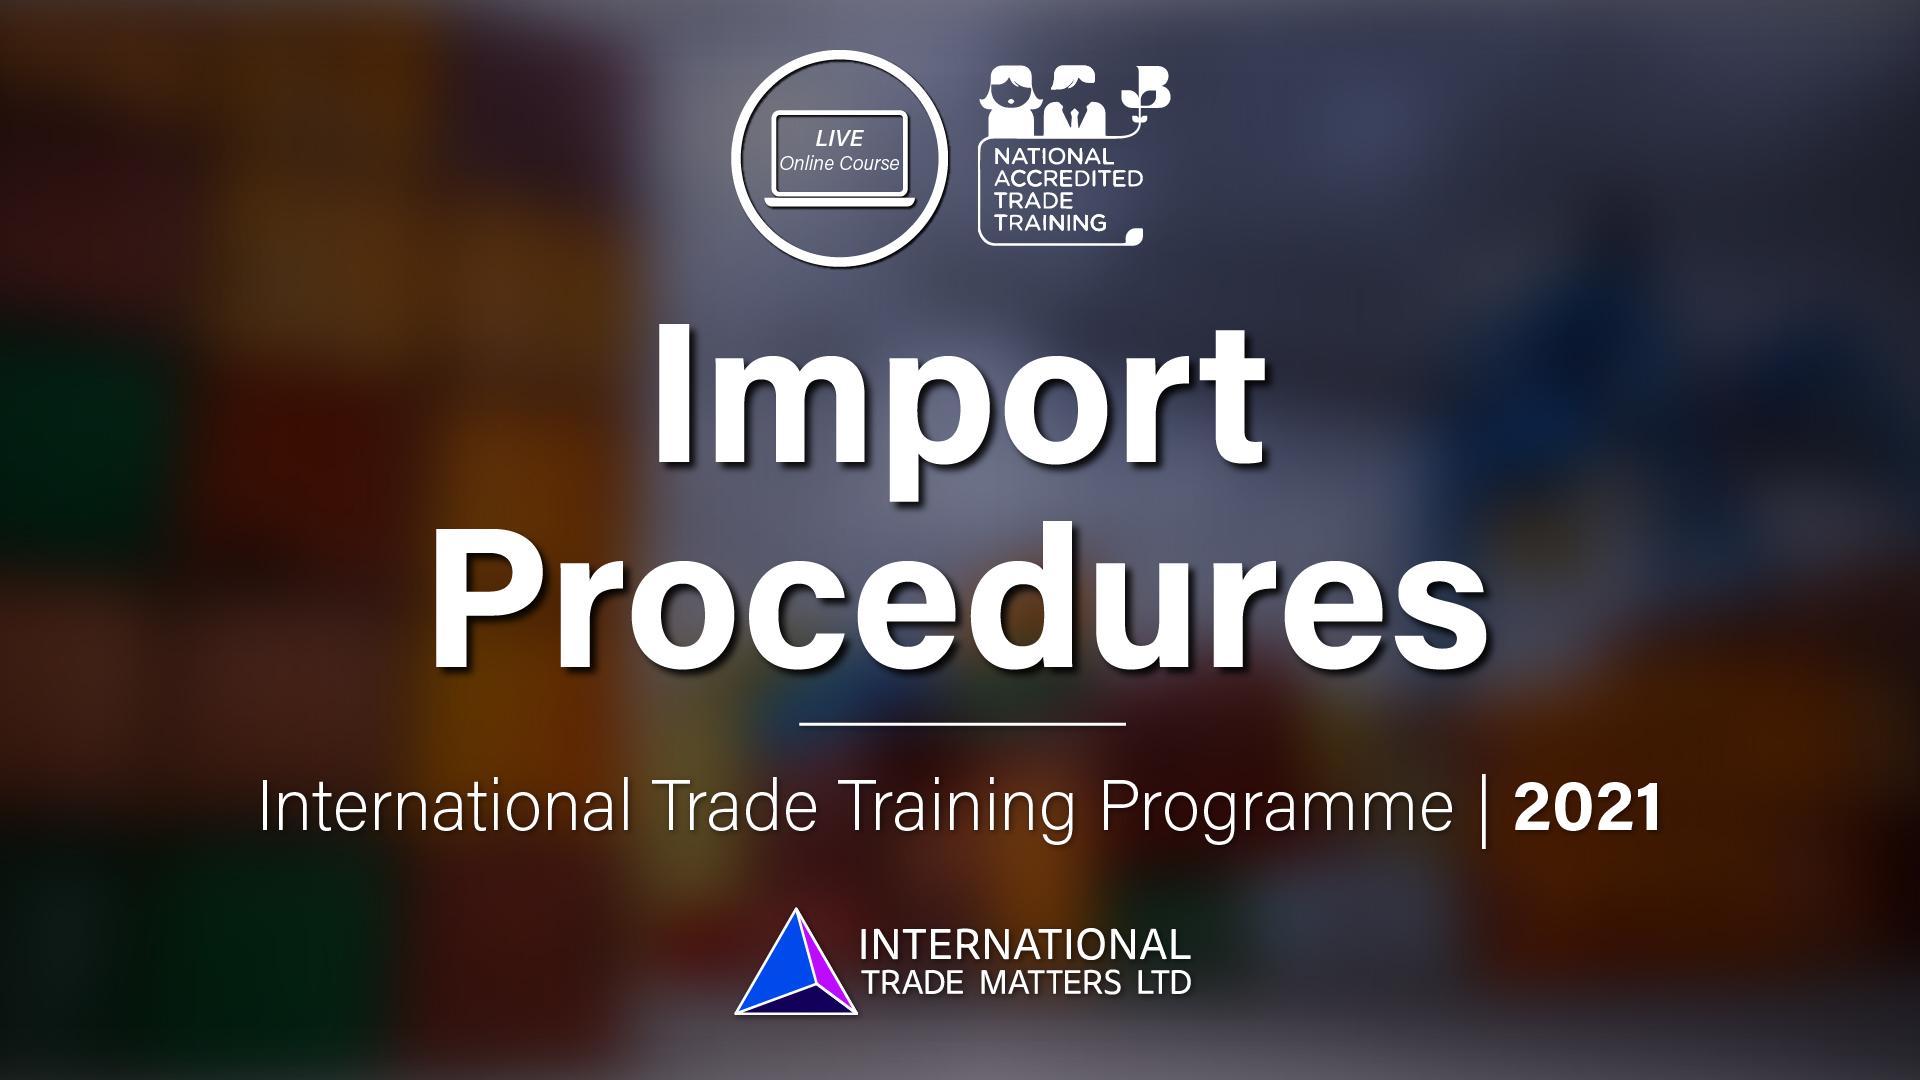 Import Procedures - An Online Course